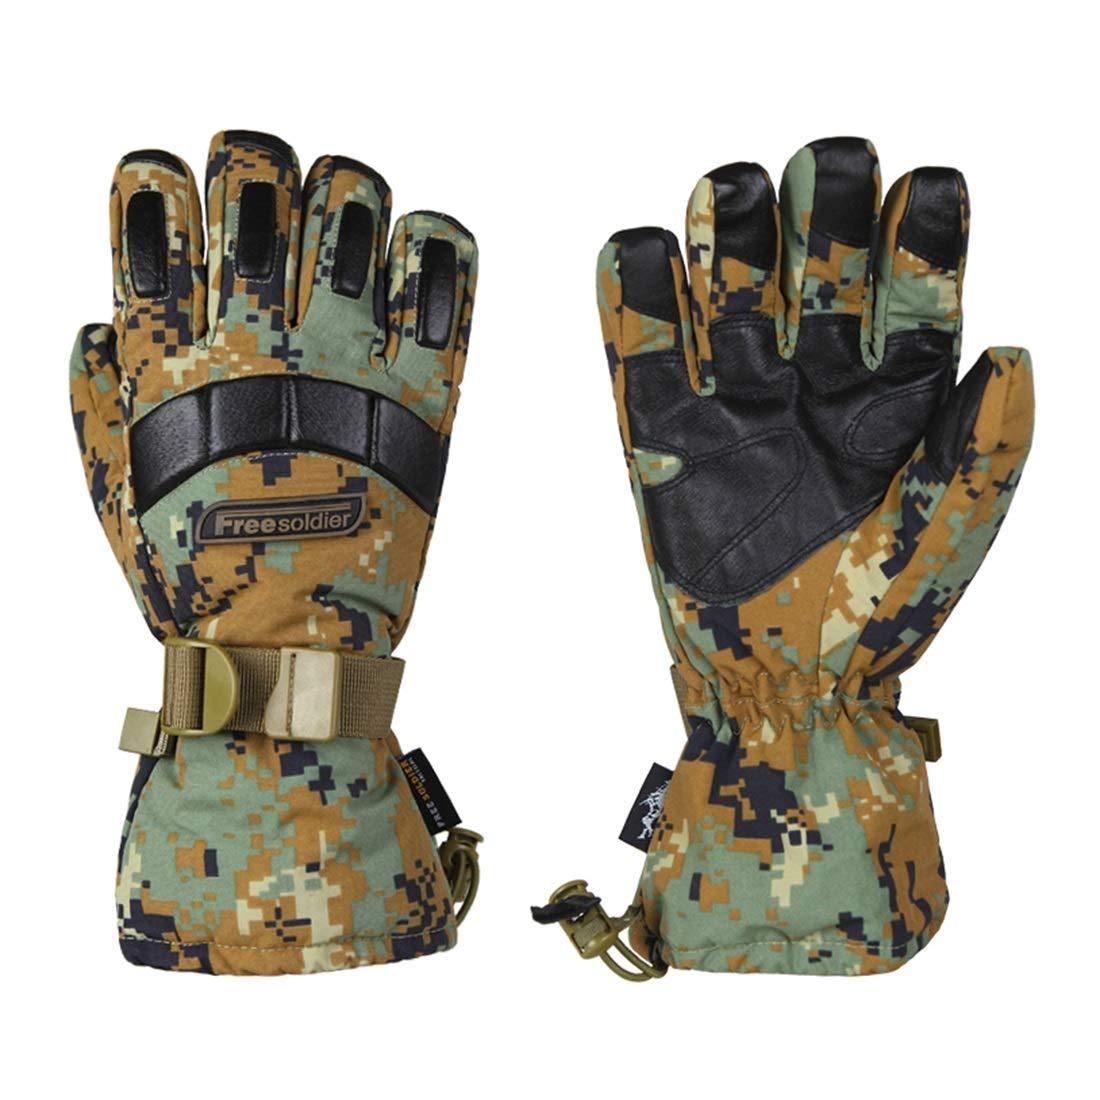 JESSIEKERVIN YY3 Geier Armee Fan Taktische Handschuhe Winter Ski Vollfinger Handschuhe Rutschfeste Wasserdichte Reithandschuhe